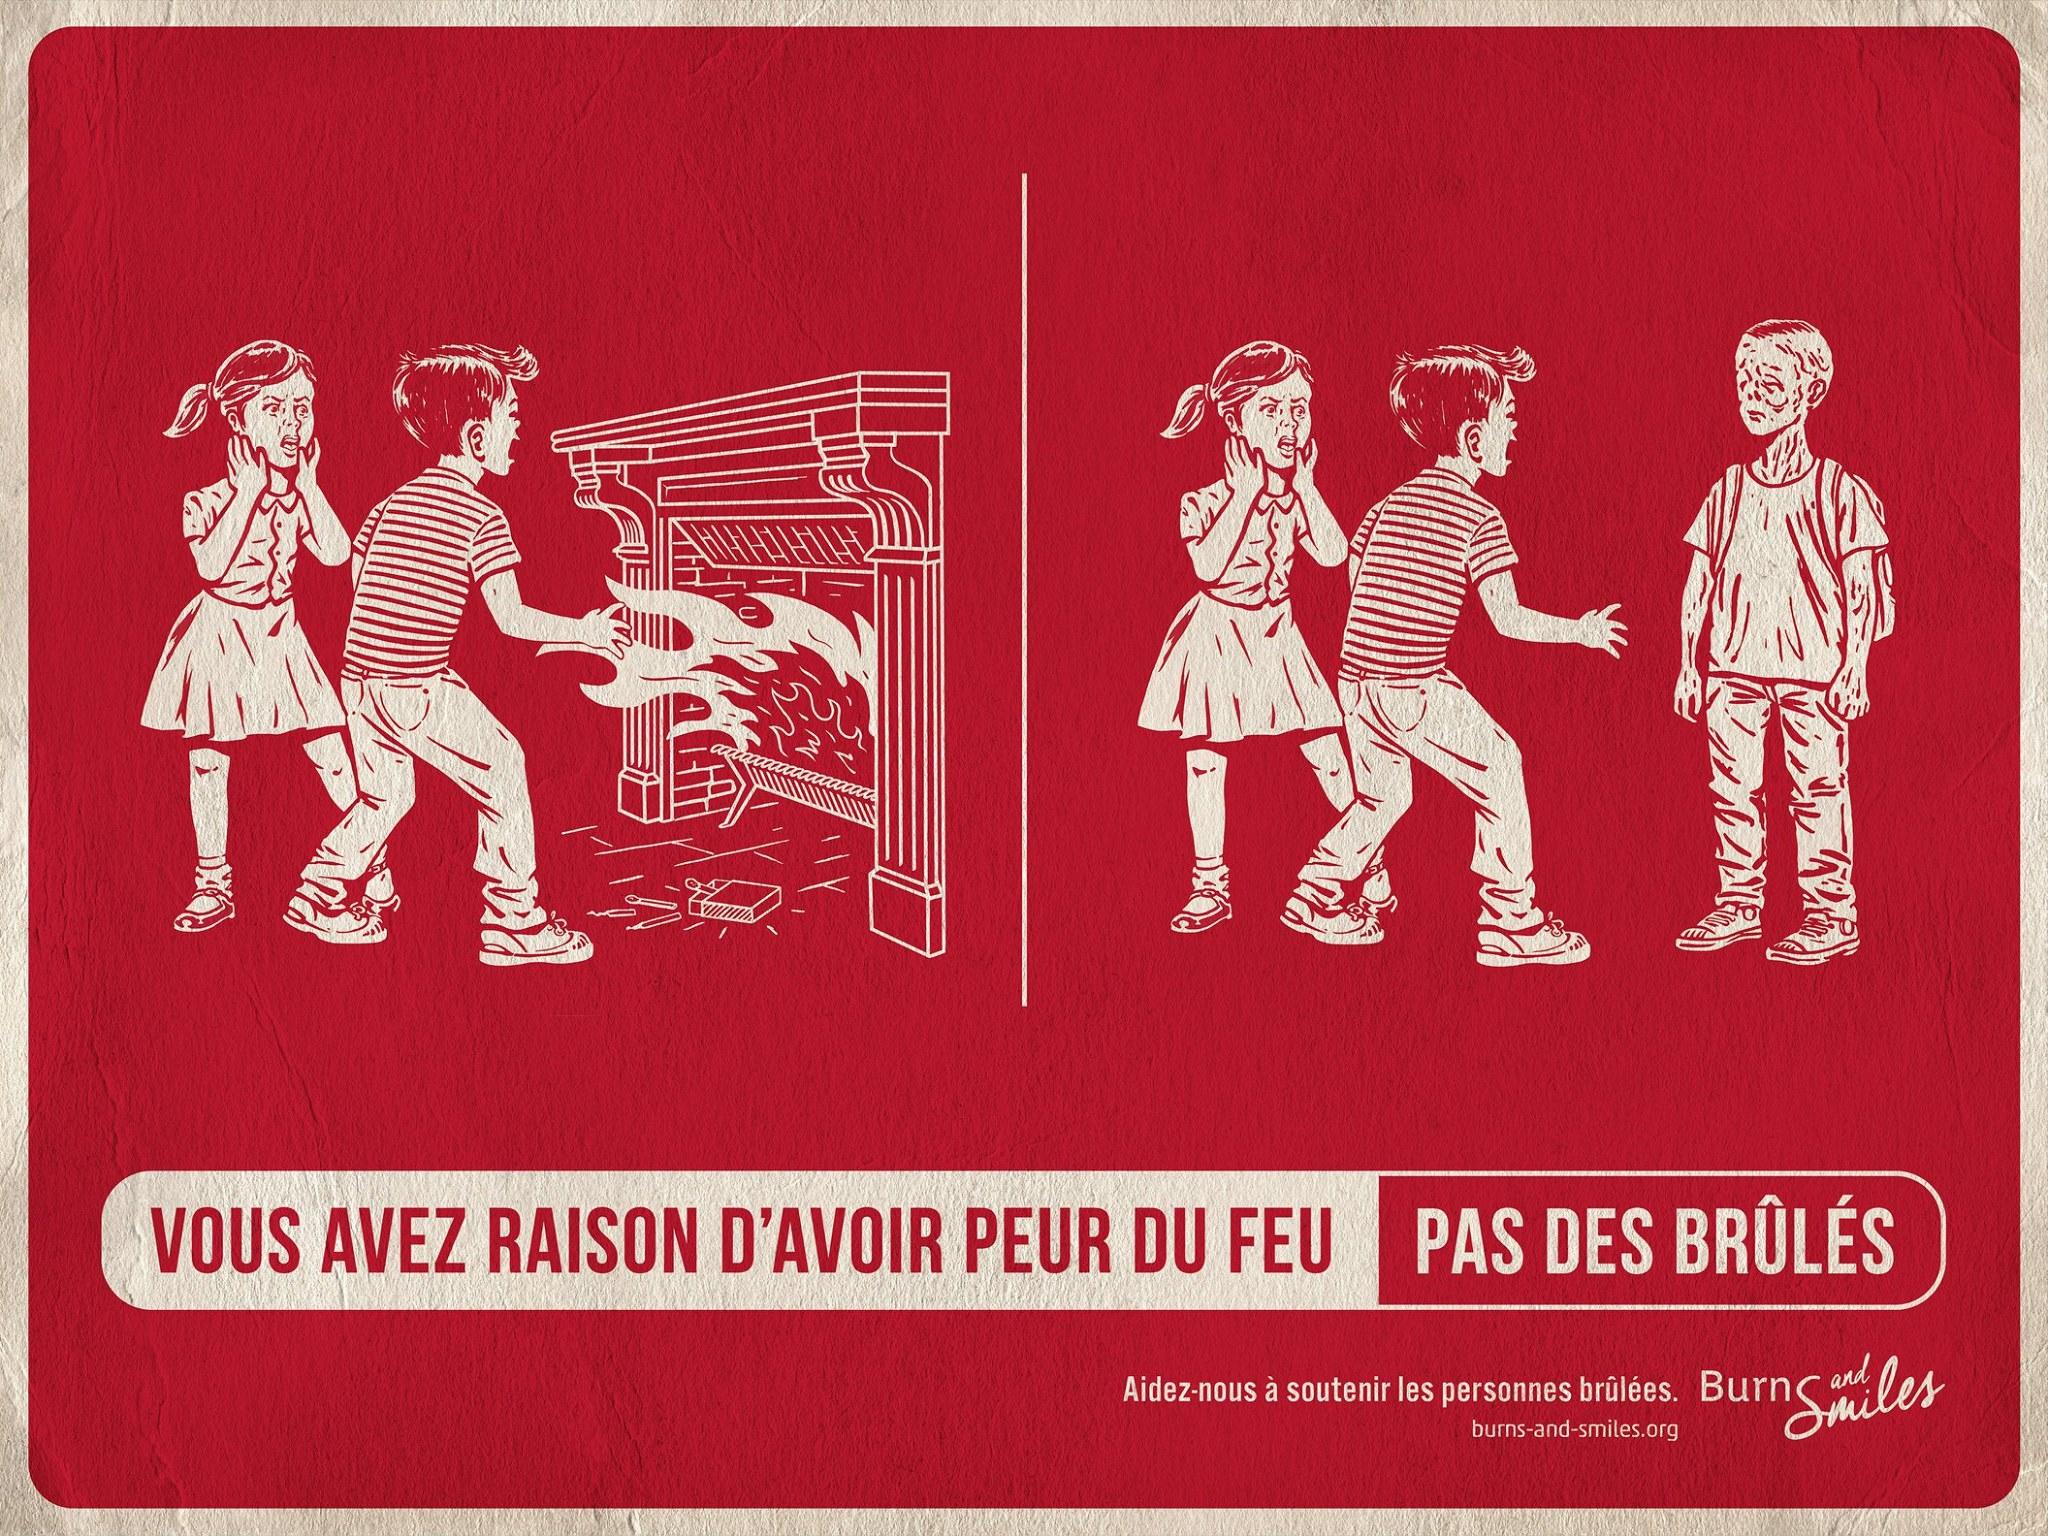 burns-and-smiles-publicite-communication-print-press-ad-feu-brules-burn-agence-tbwa-paris-3